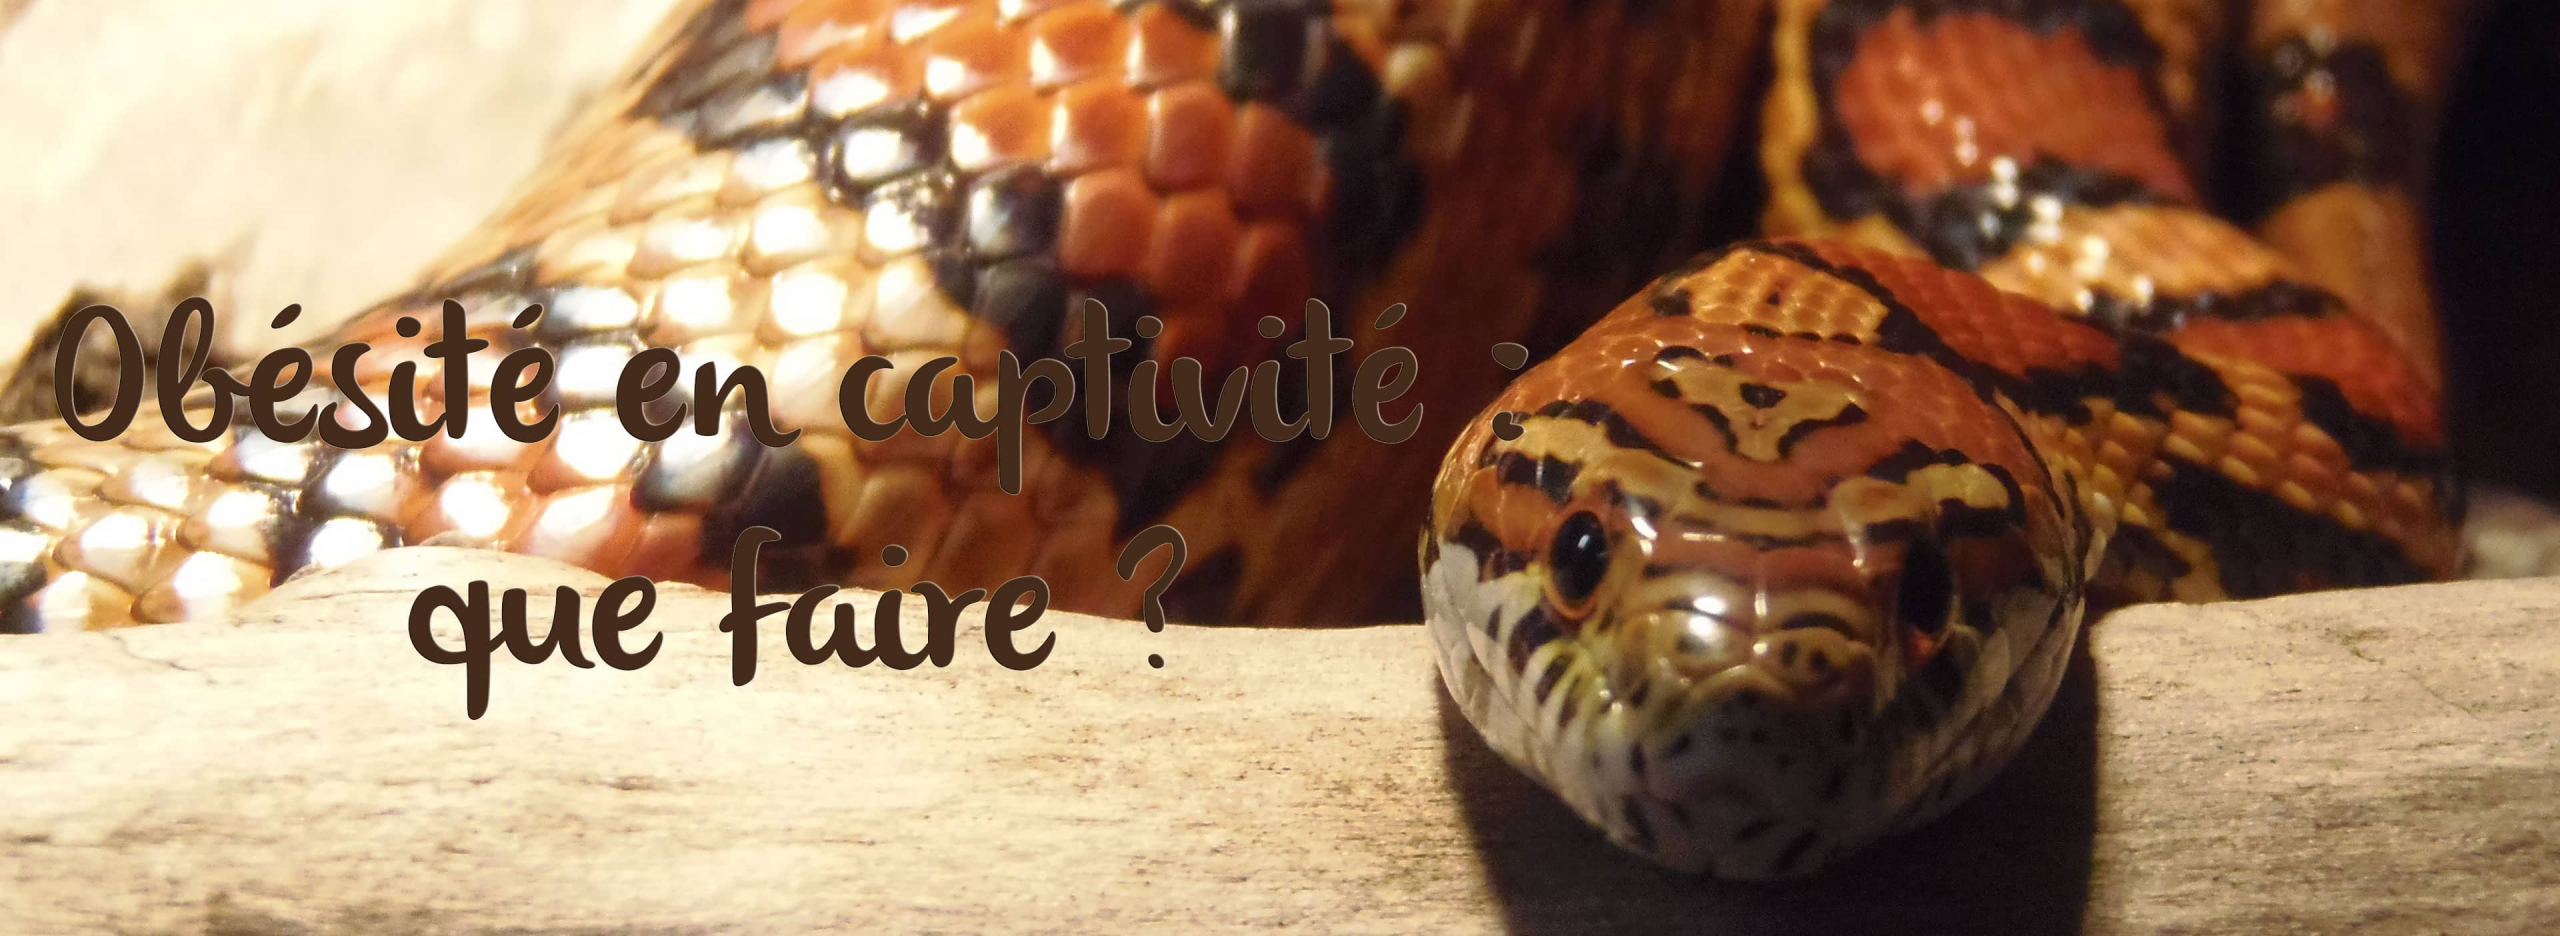 obesite-reptile-captivite